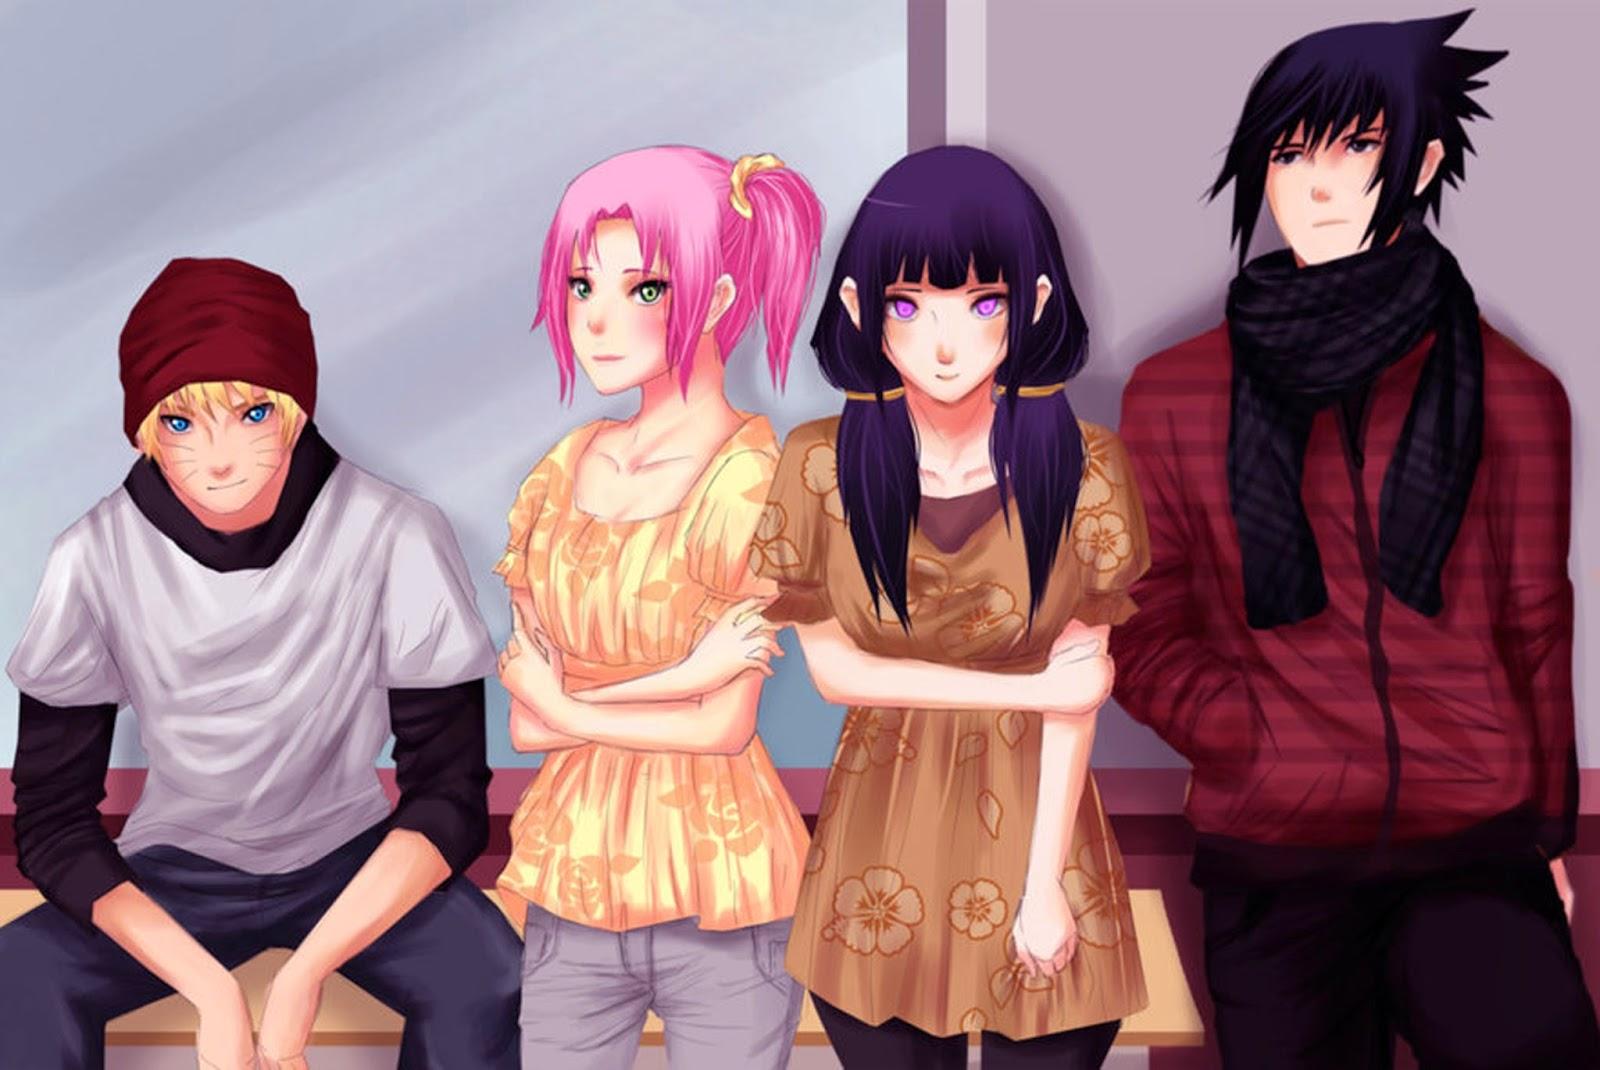 Gambar Naruto | Gambar Naruto dan Anime Lainnnya